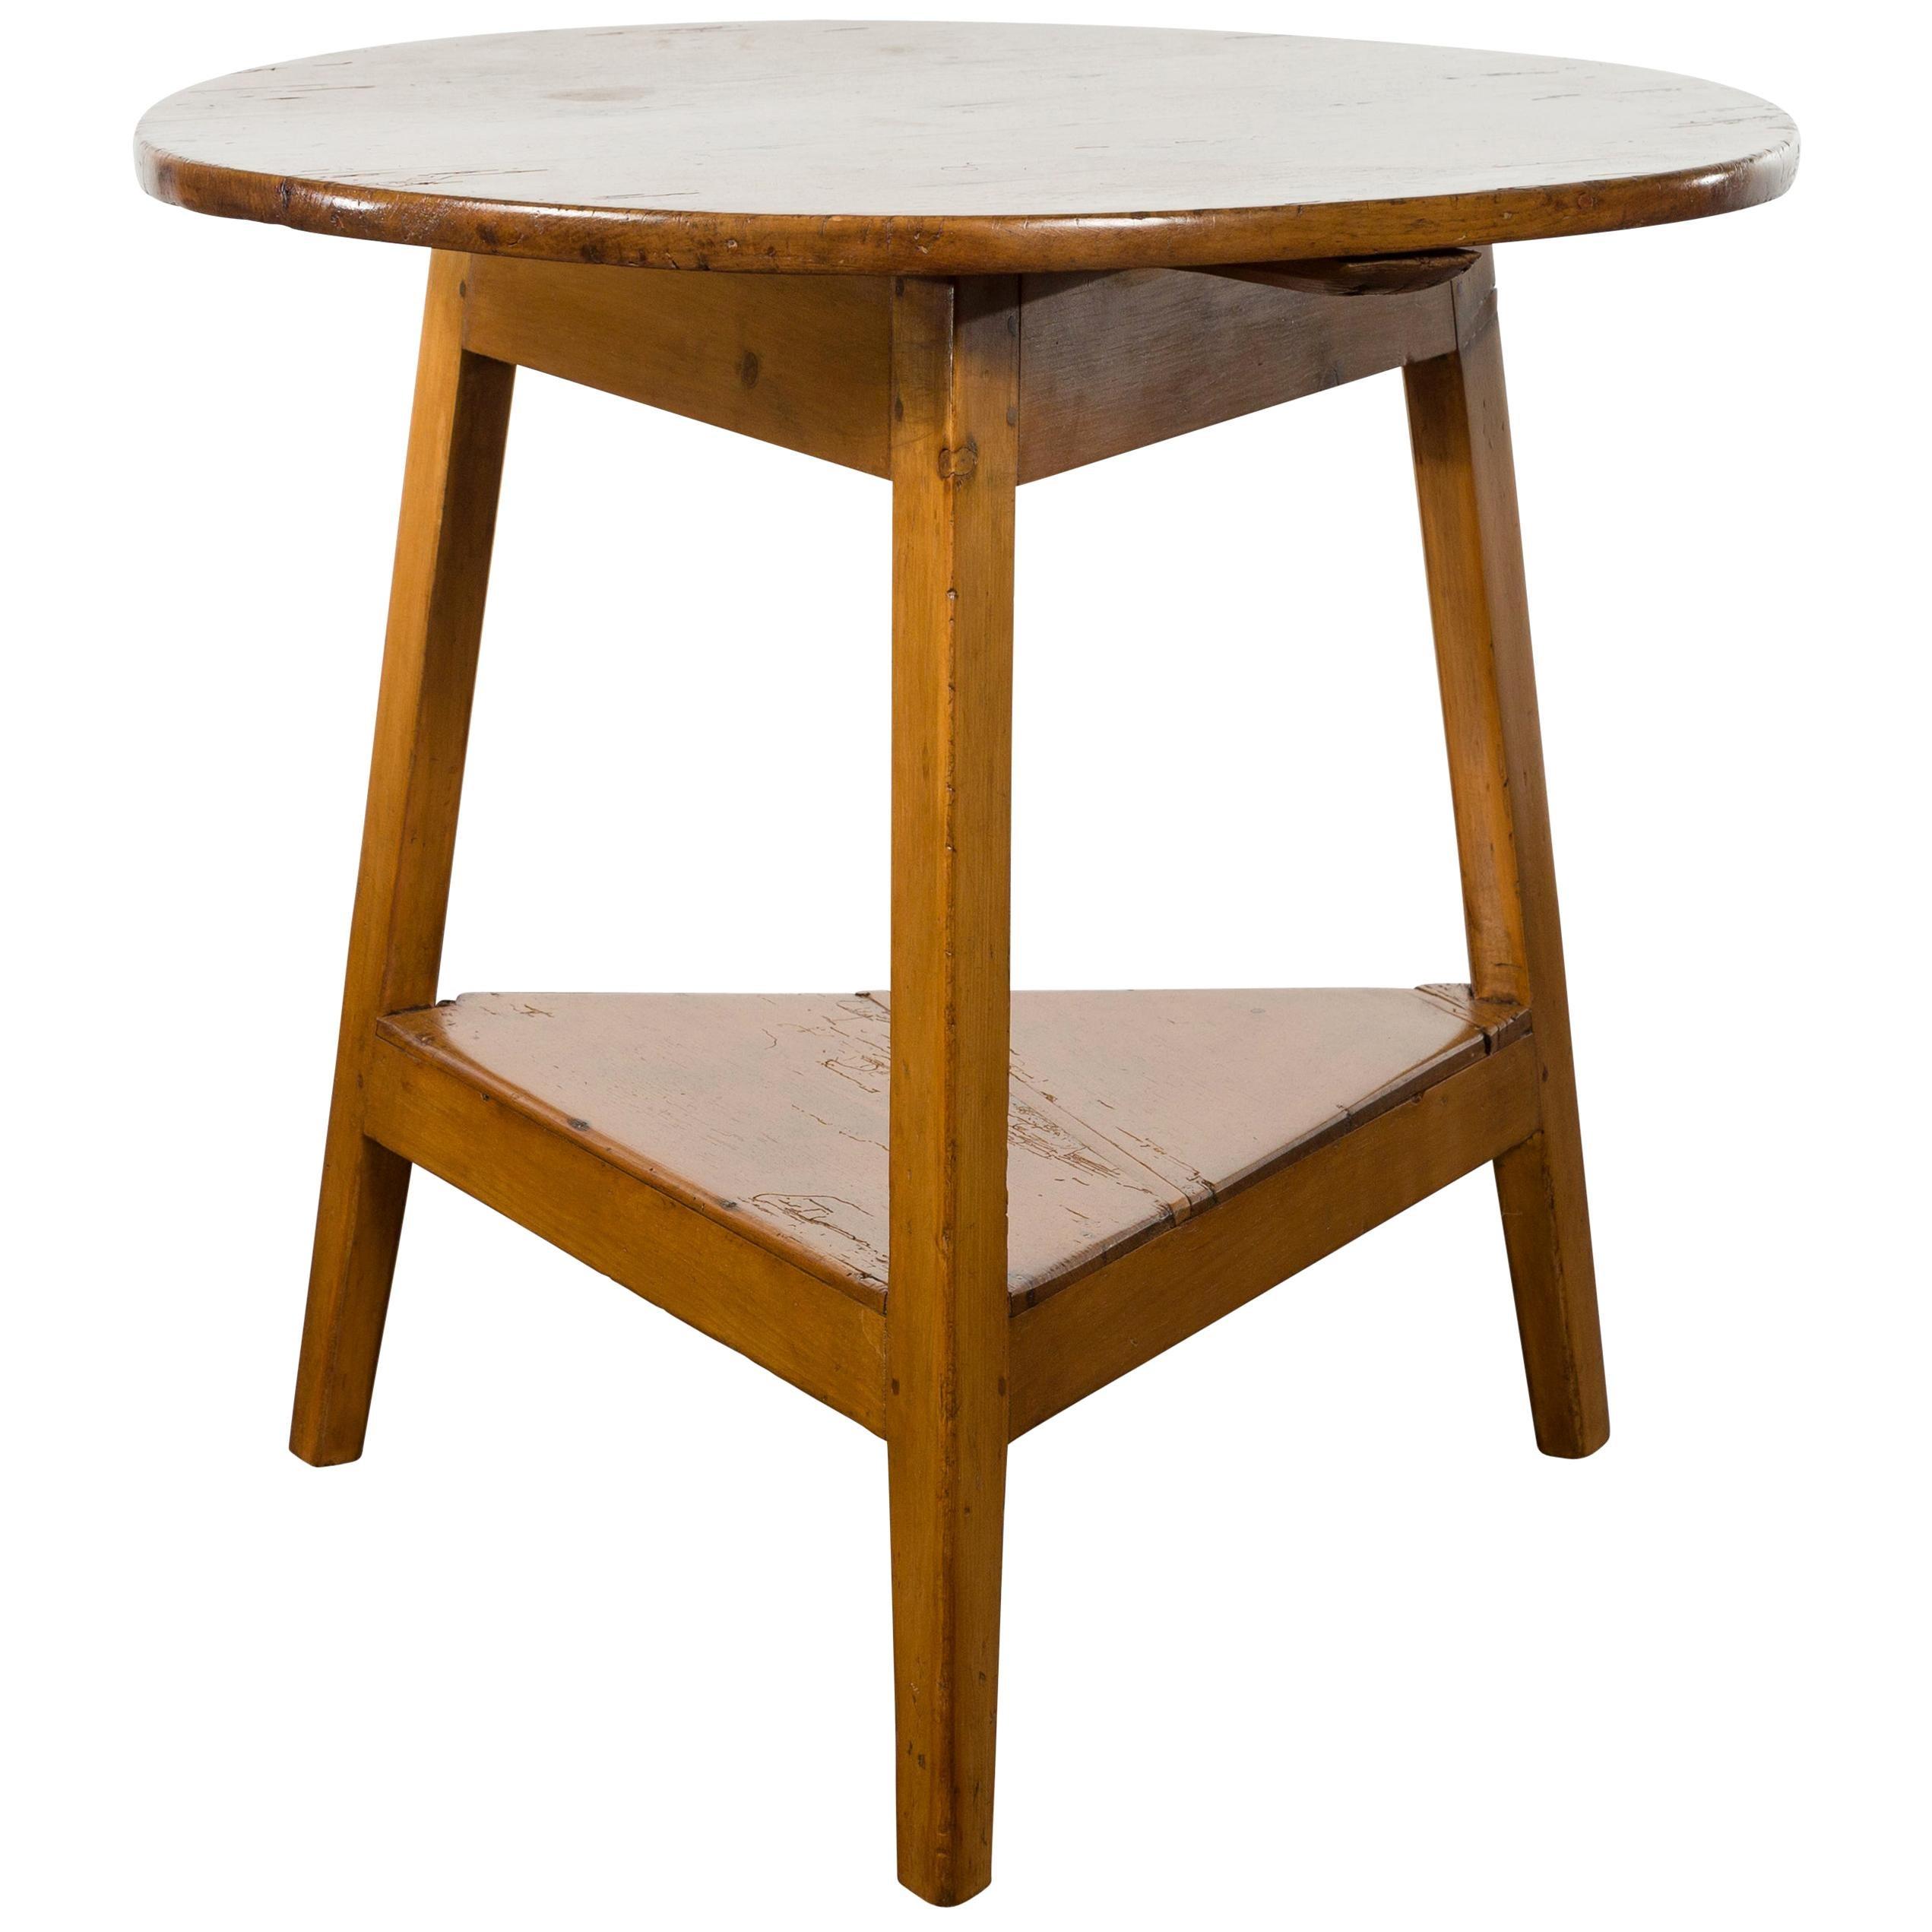 English 1870s Pine Cricket Table with Circular Top and Triangular Shelf